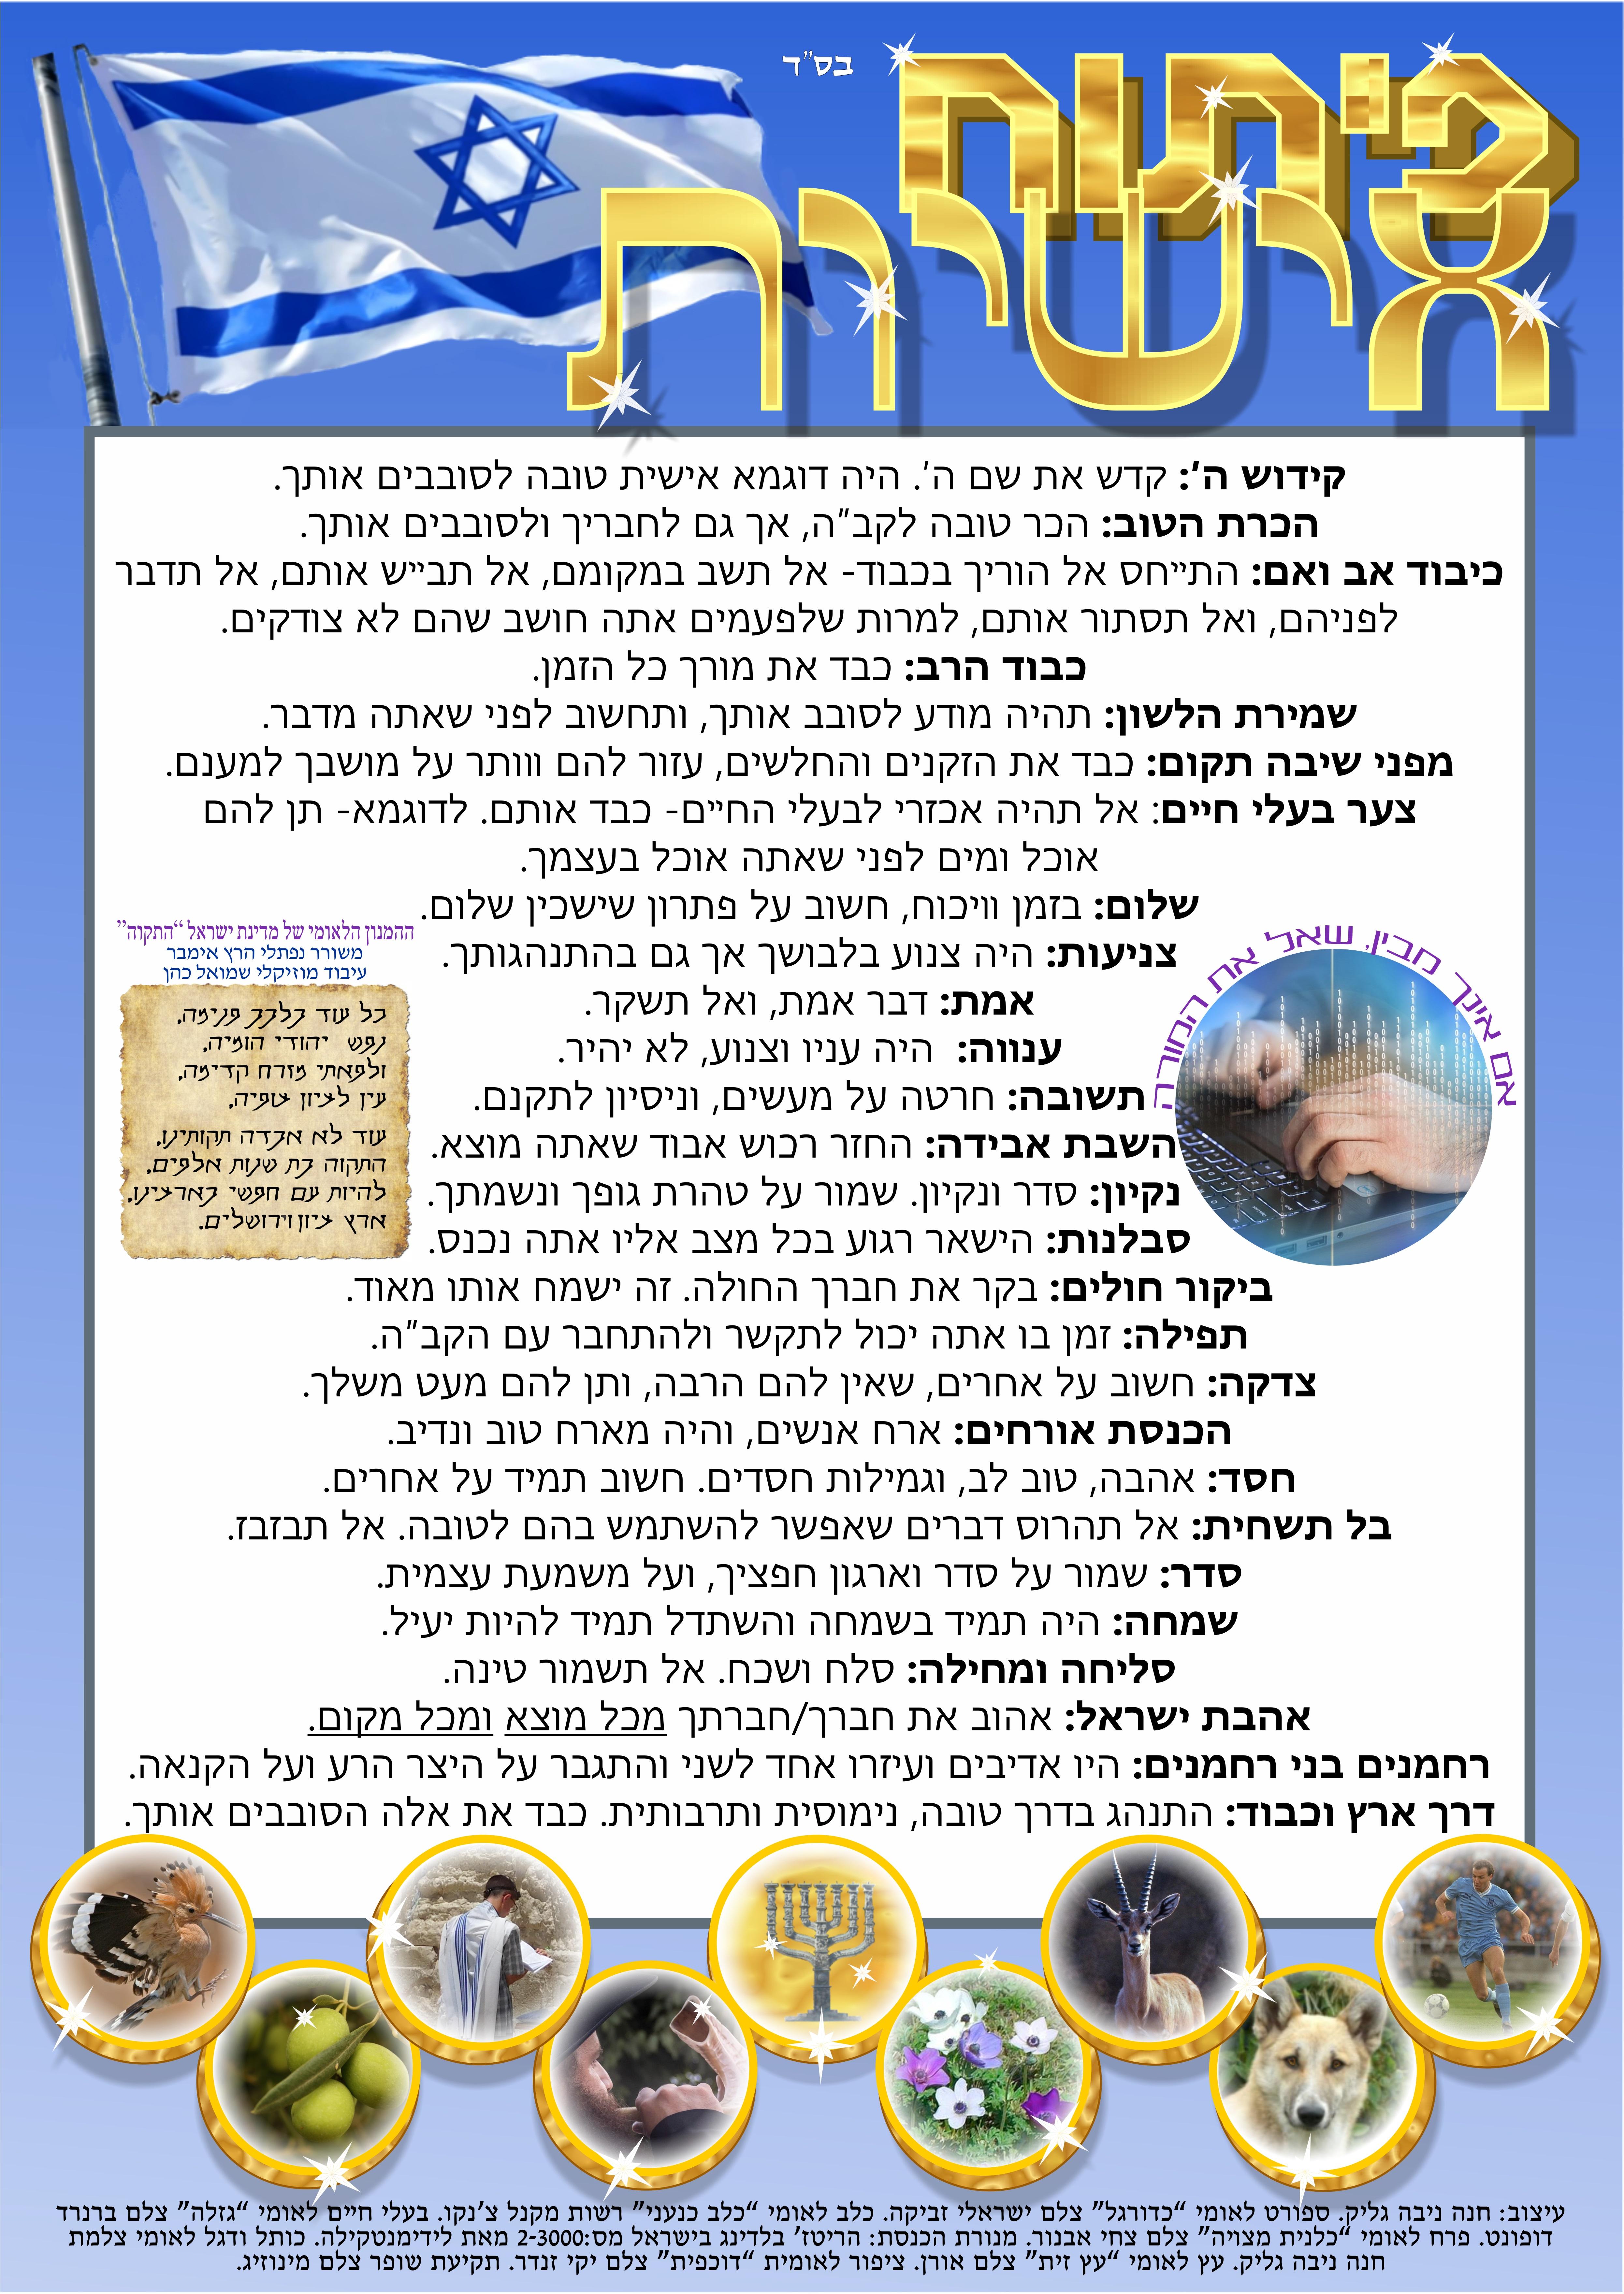 Httpwww Overlordsofchaos Comhtmlorigin Of The Word Jew Html: TeachersTrading.com ISRAELI POSTER NEW PAINT